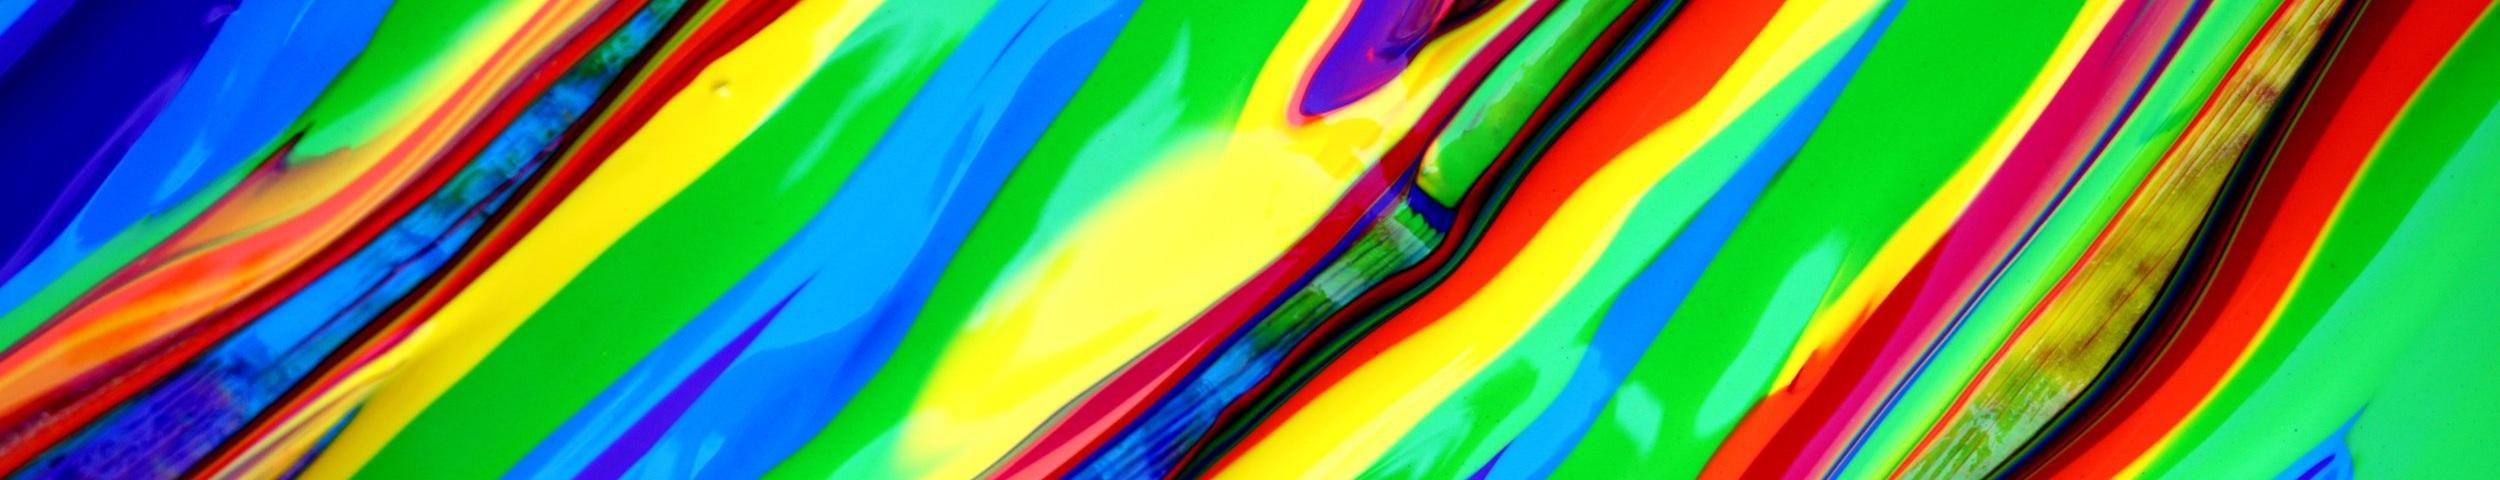 art-artistic-bright-1317559.jpg